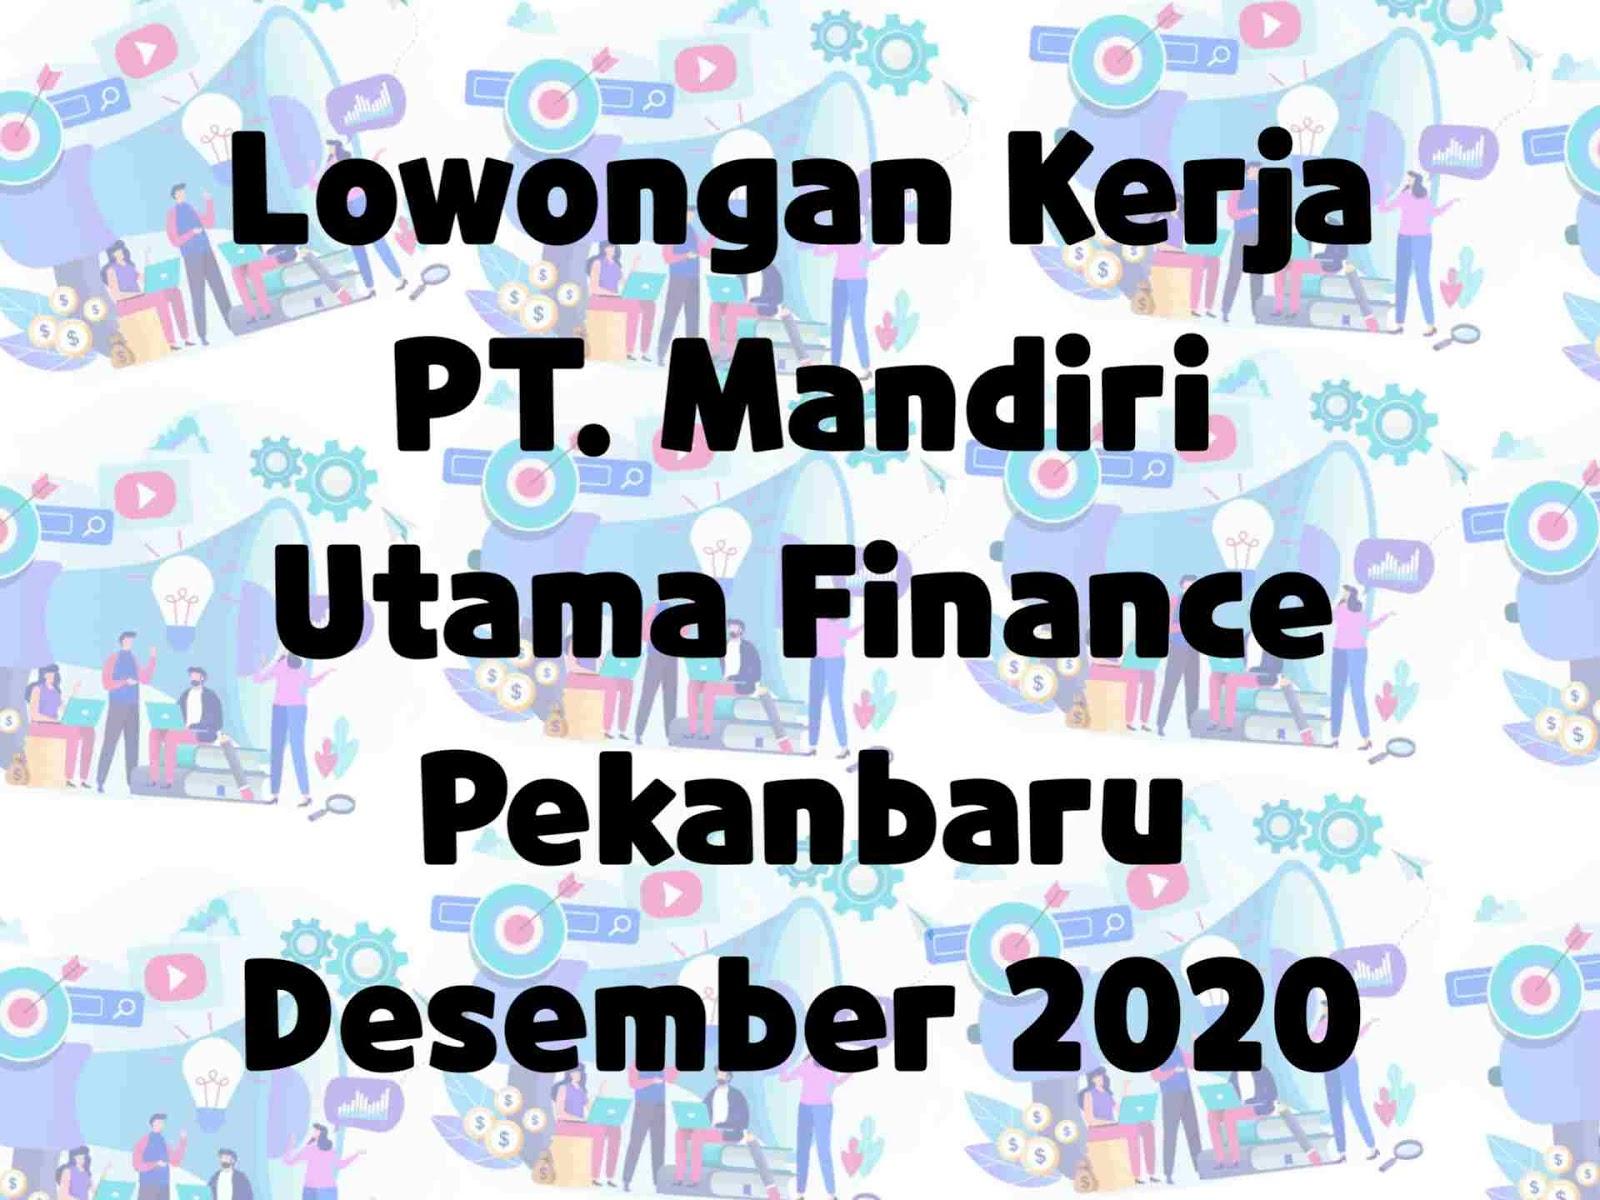 Lowongan Kerja PT. Mandiri Utama Finance Pekanbaru Desember 2020